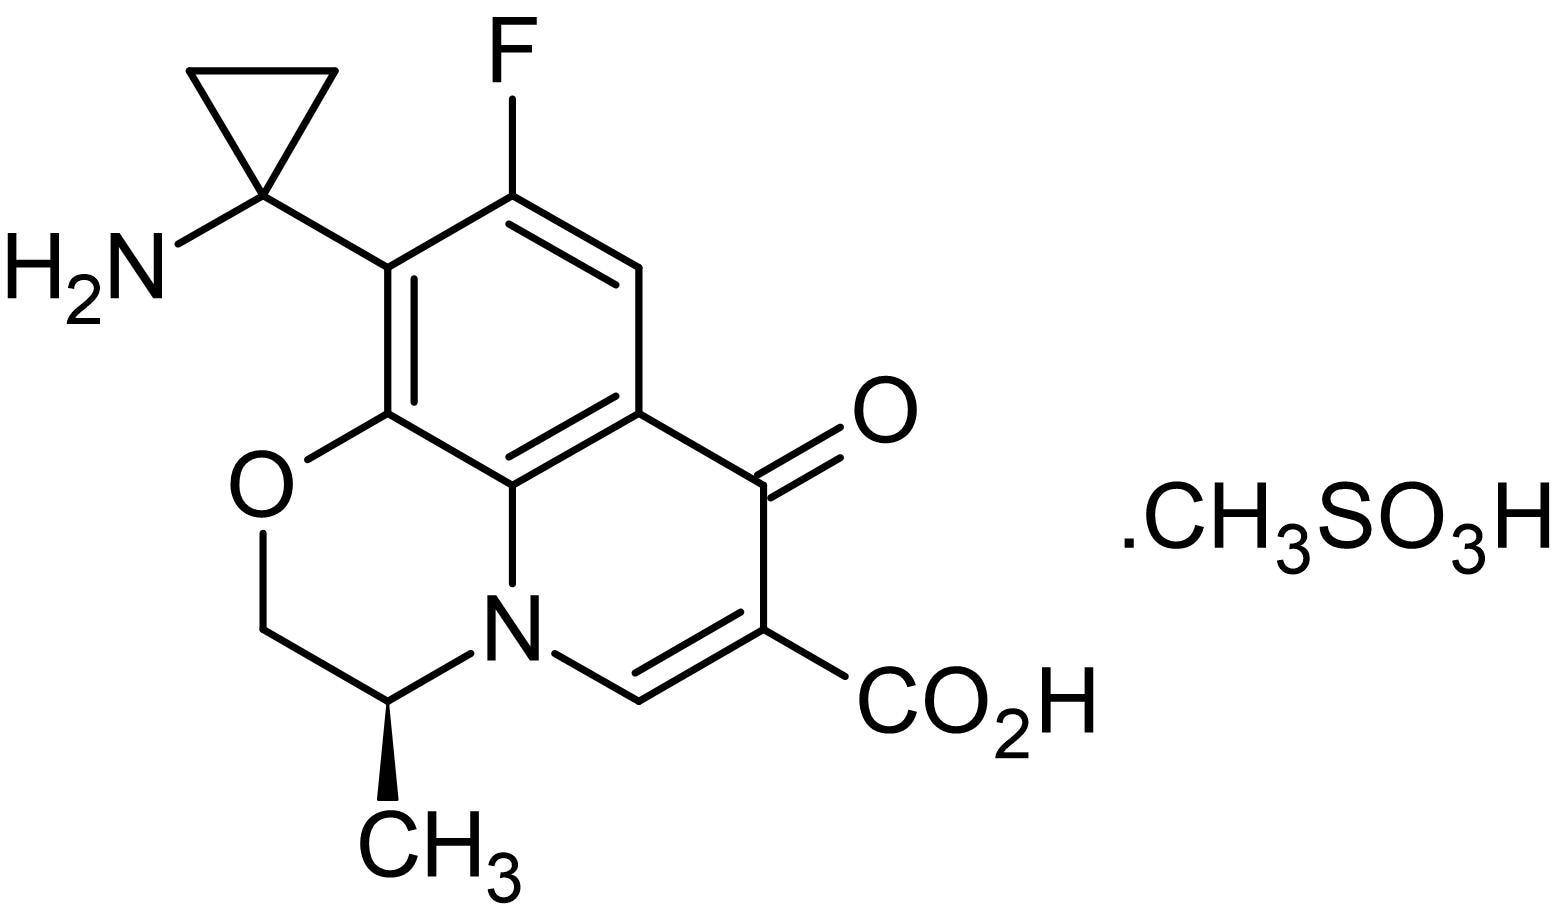 Chemical Structure - Pazufloxacin mesylate (T3762), fluoroquinolone antibiotic agent (ab143432)